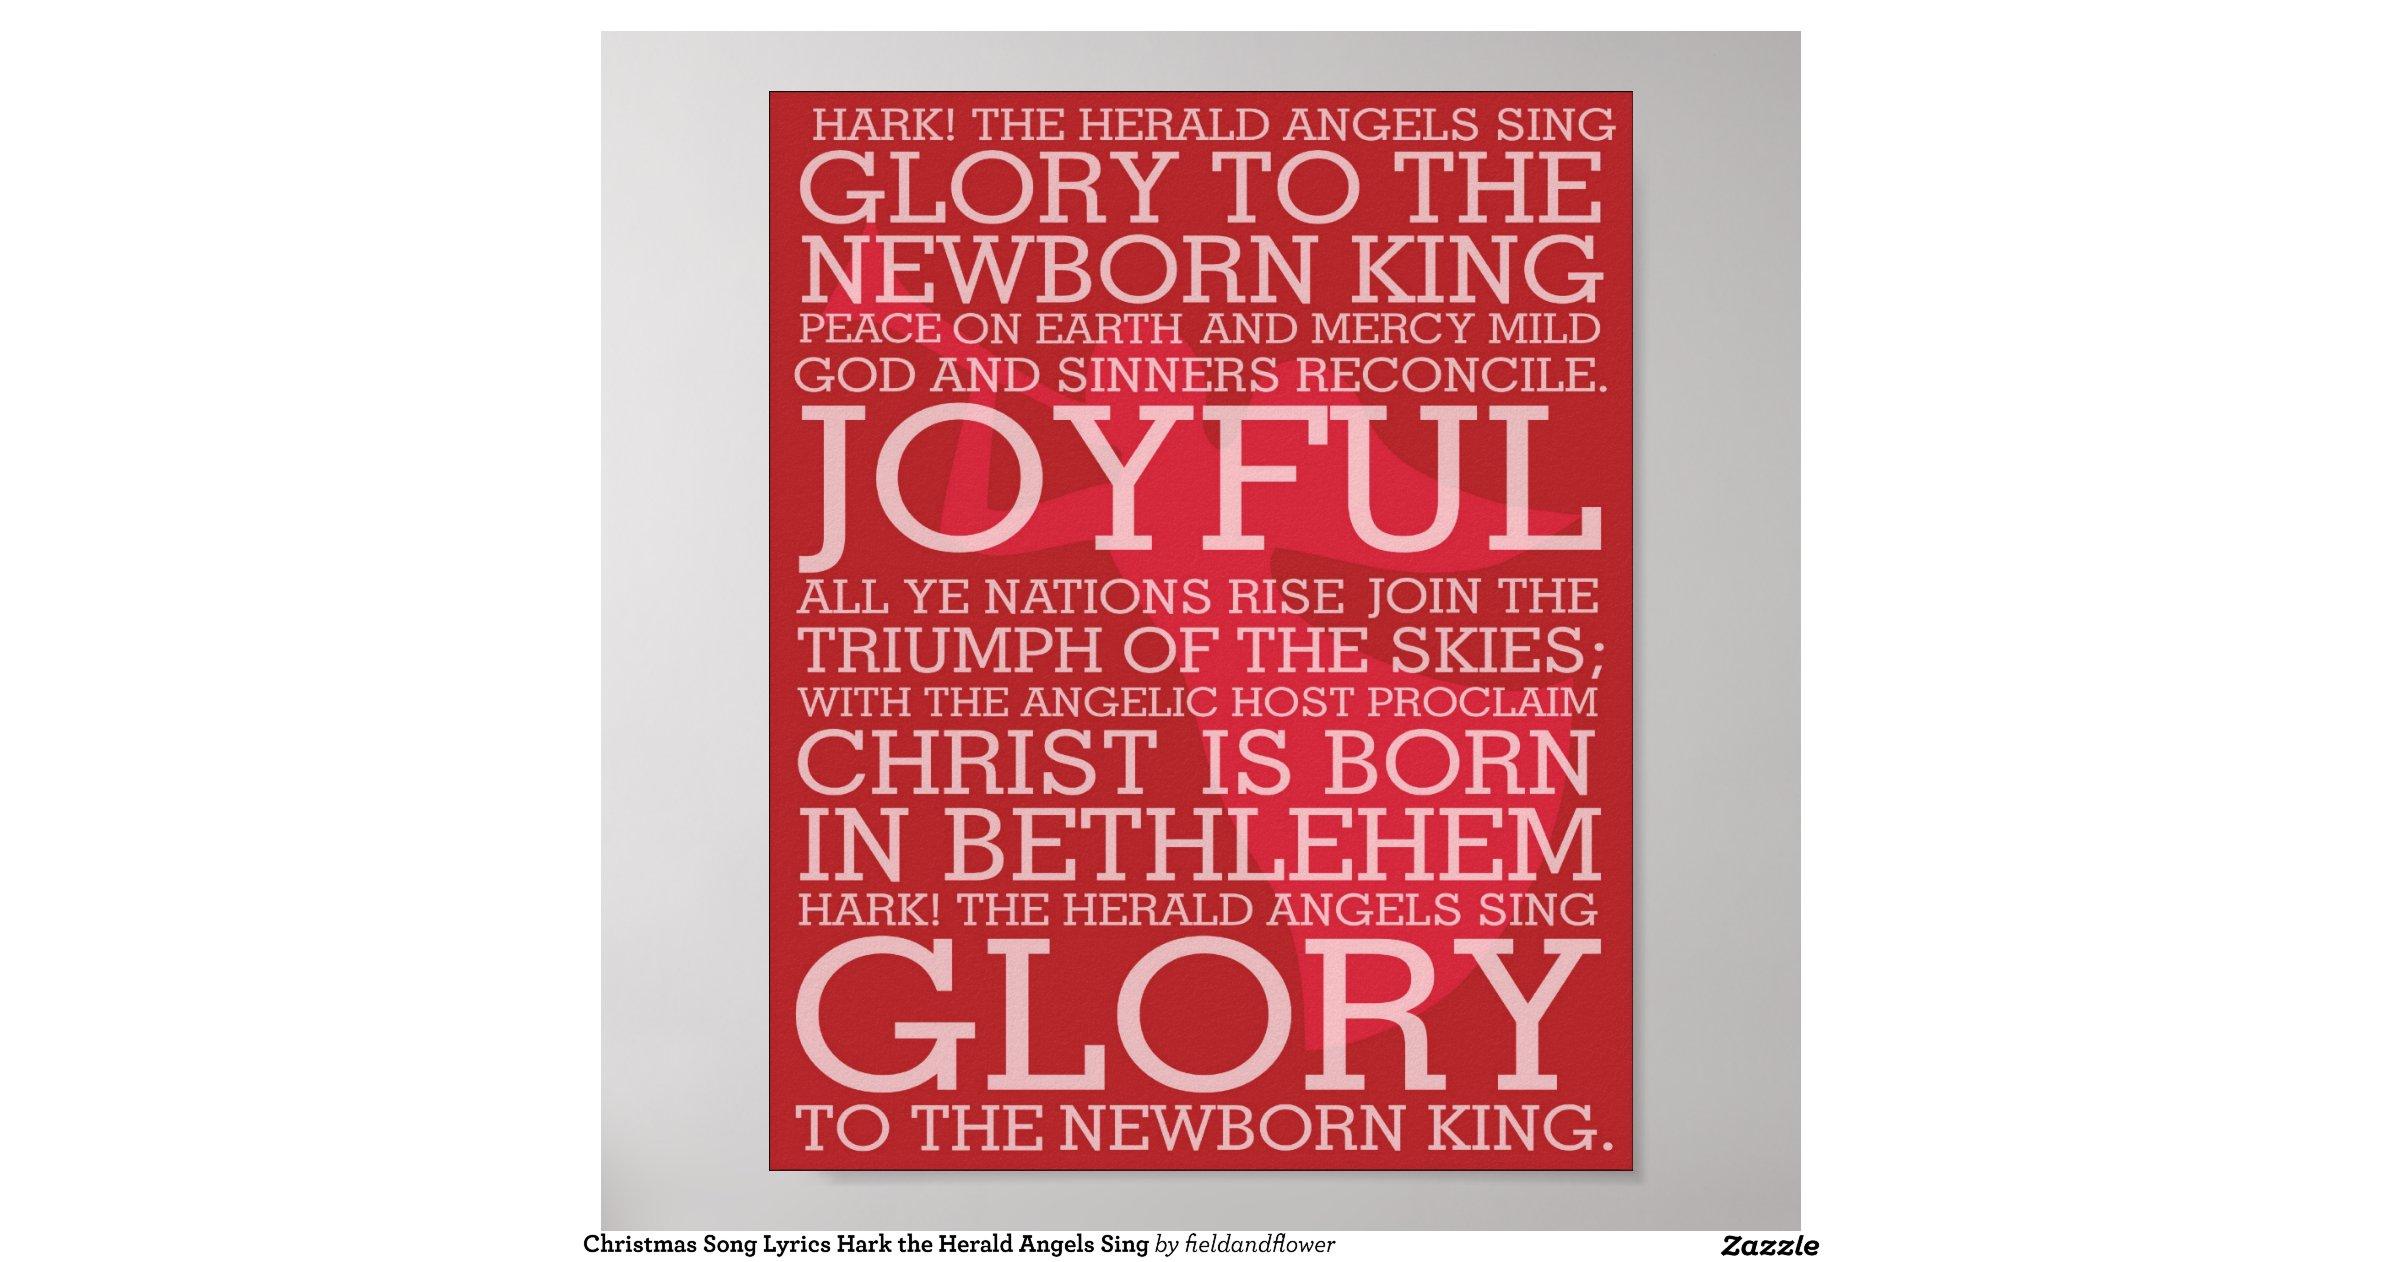 christmas_song_lyrics_hark_the_herald_angels_sing_poster-rfabbd344571142ada7c9b37f79b1d5be_wva ...